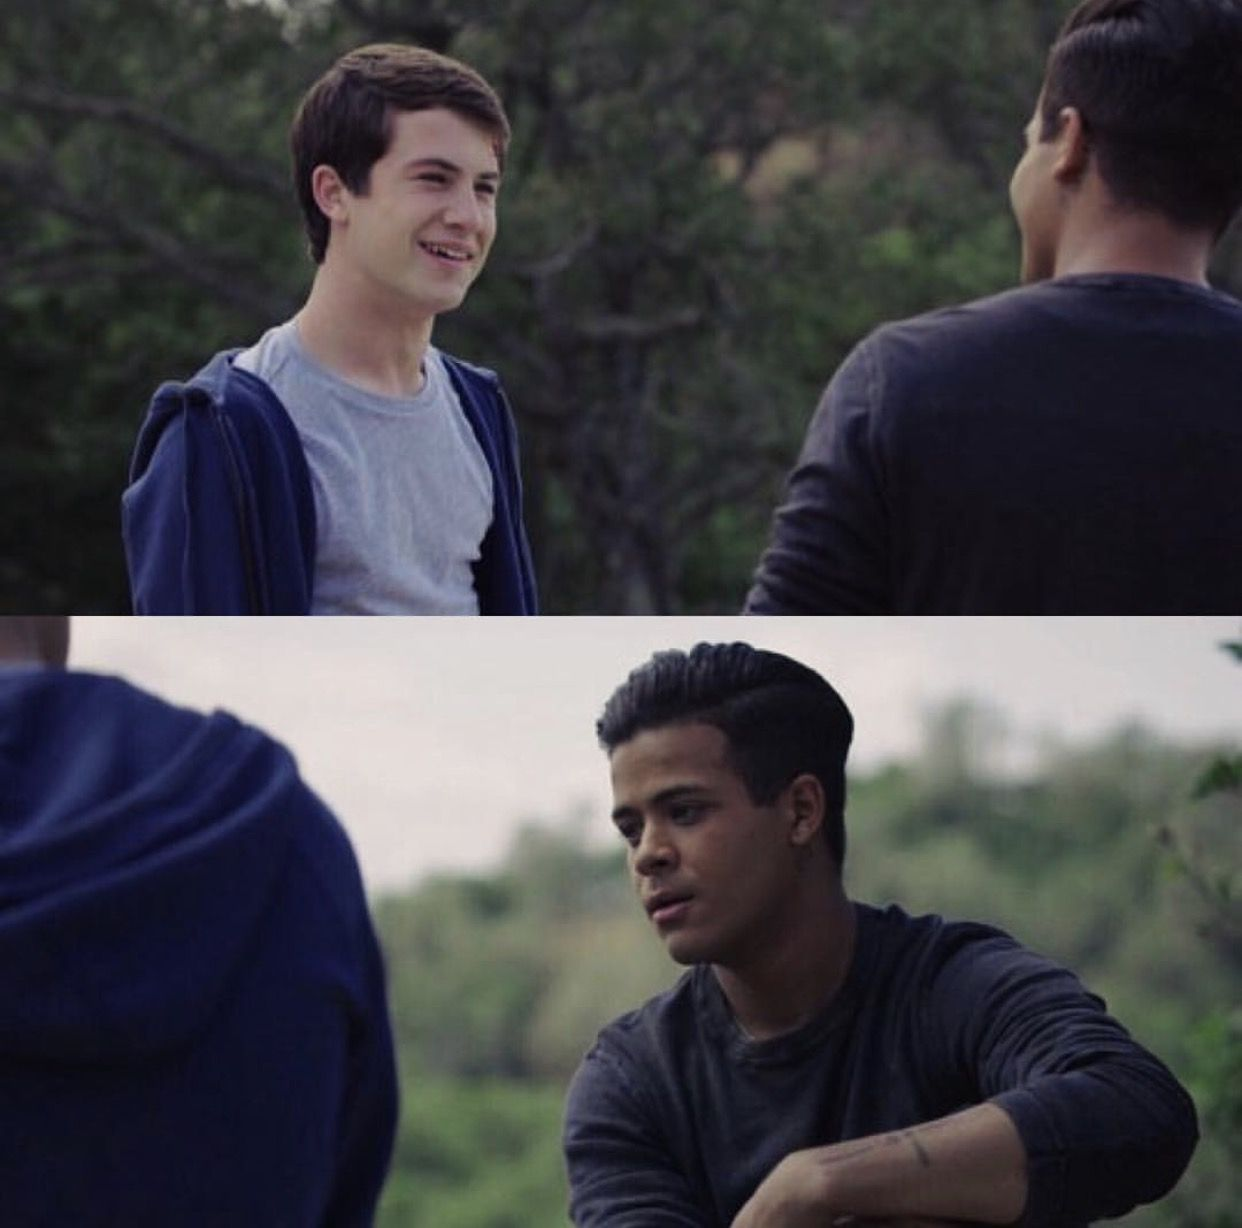 Clay and Tony - 13 Reasons Why | 13 Reasons Why (Netflix Original